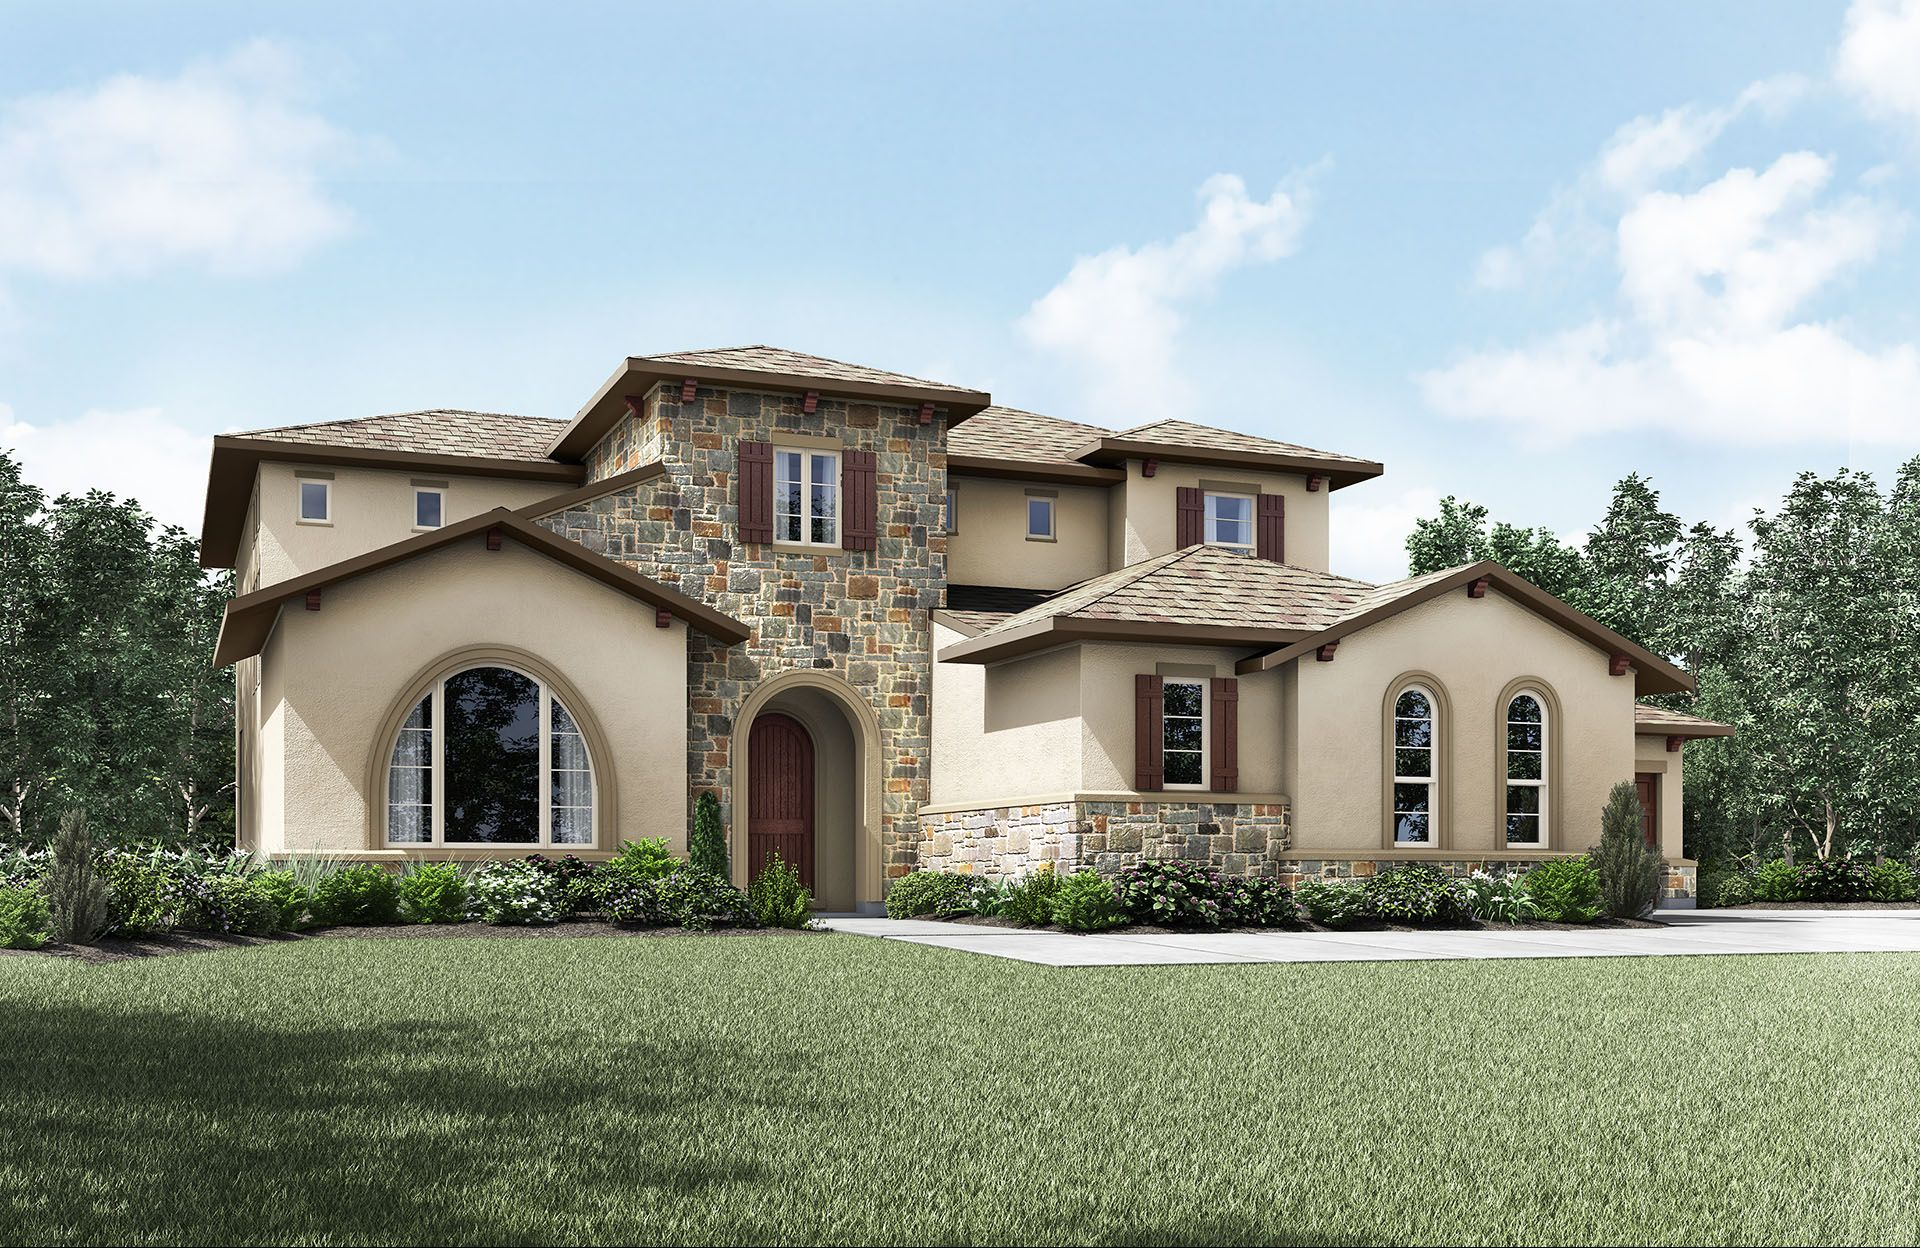 Single Family for Sale at Cimarron Hills - Lynmar 307 Flint Ridge Georgetown, Texas 78628 United States